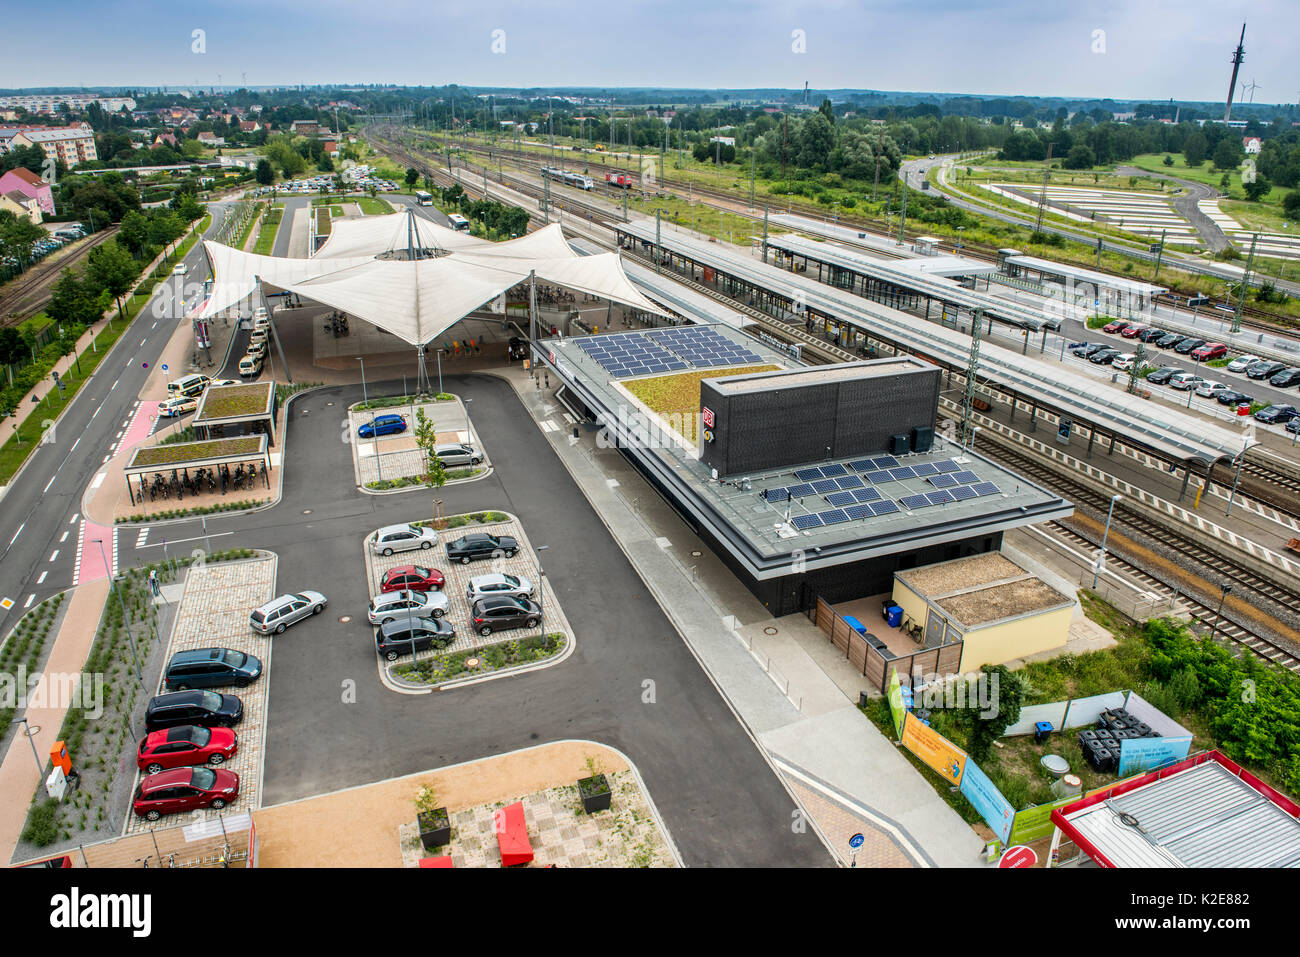 Environmentally friendly railway station, Wittenberg, Saxony-Anhalt, Germany - Stock Image